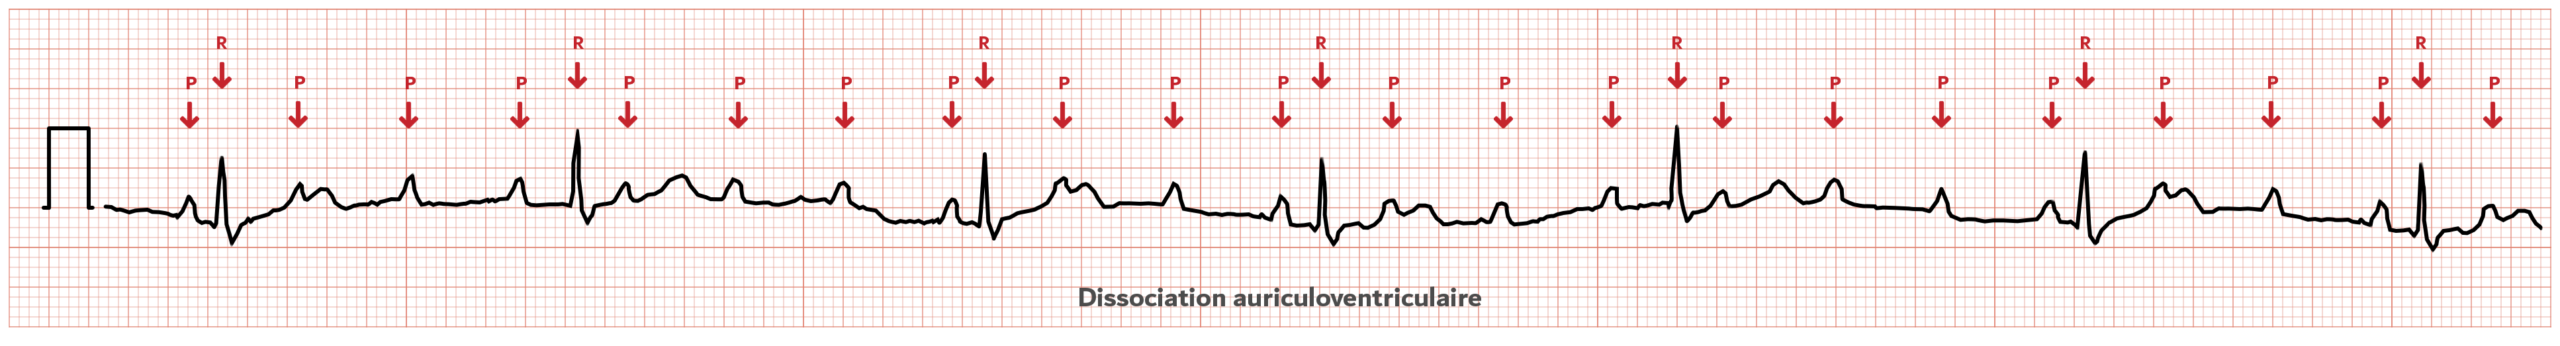 Dissociation auriculo-ventriculaire - ECG